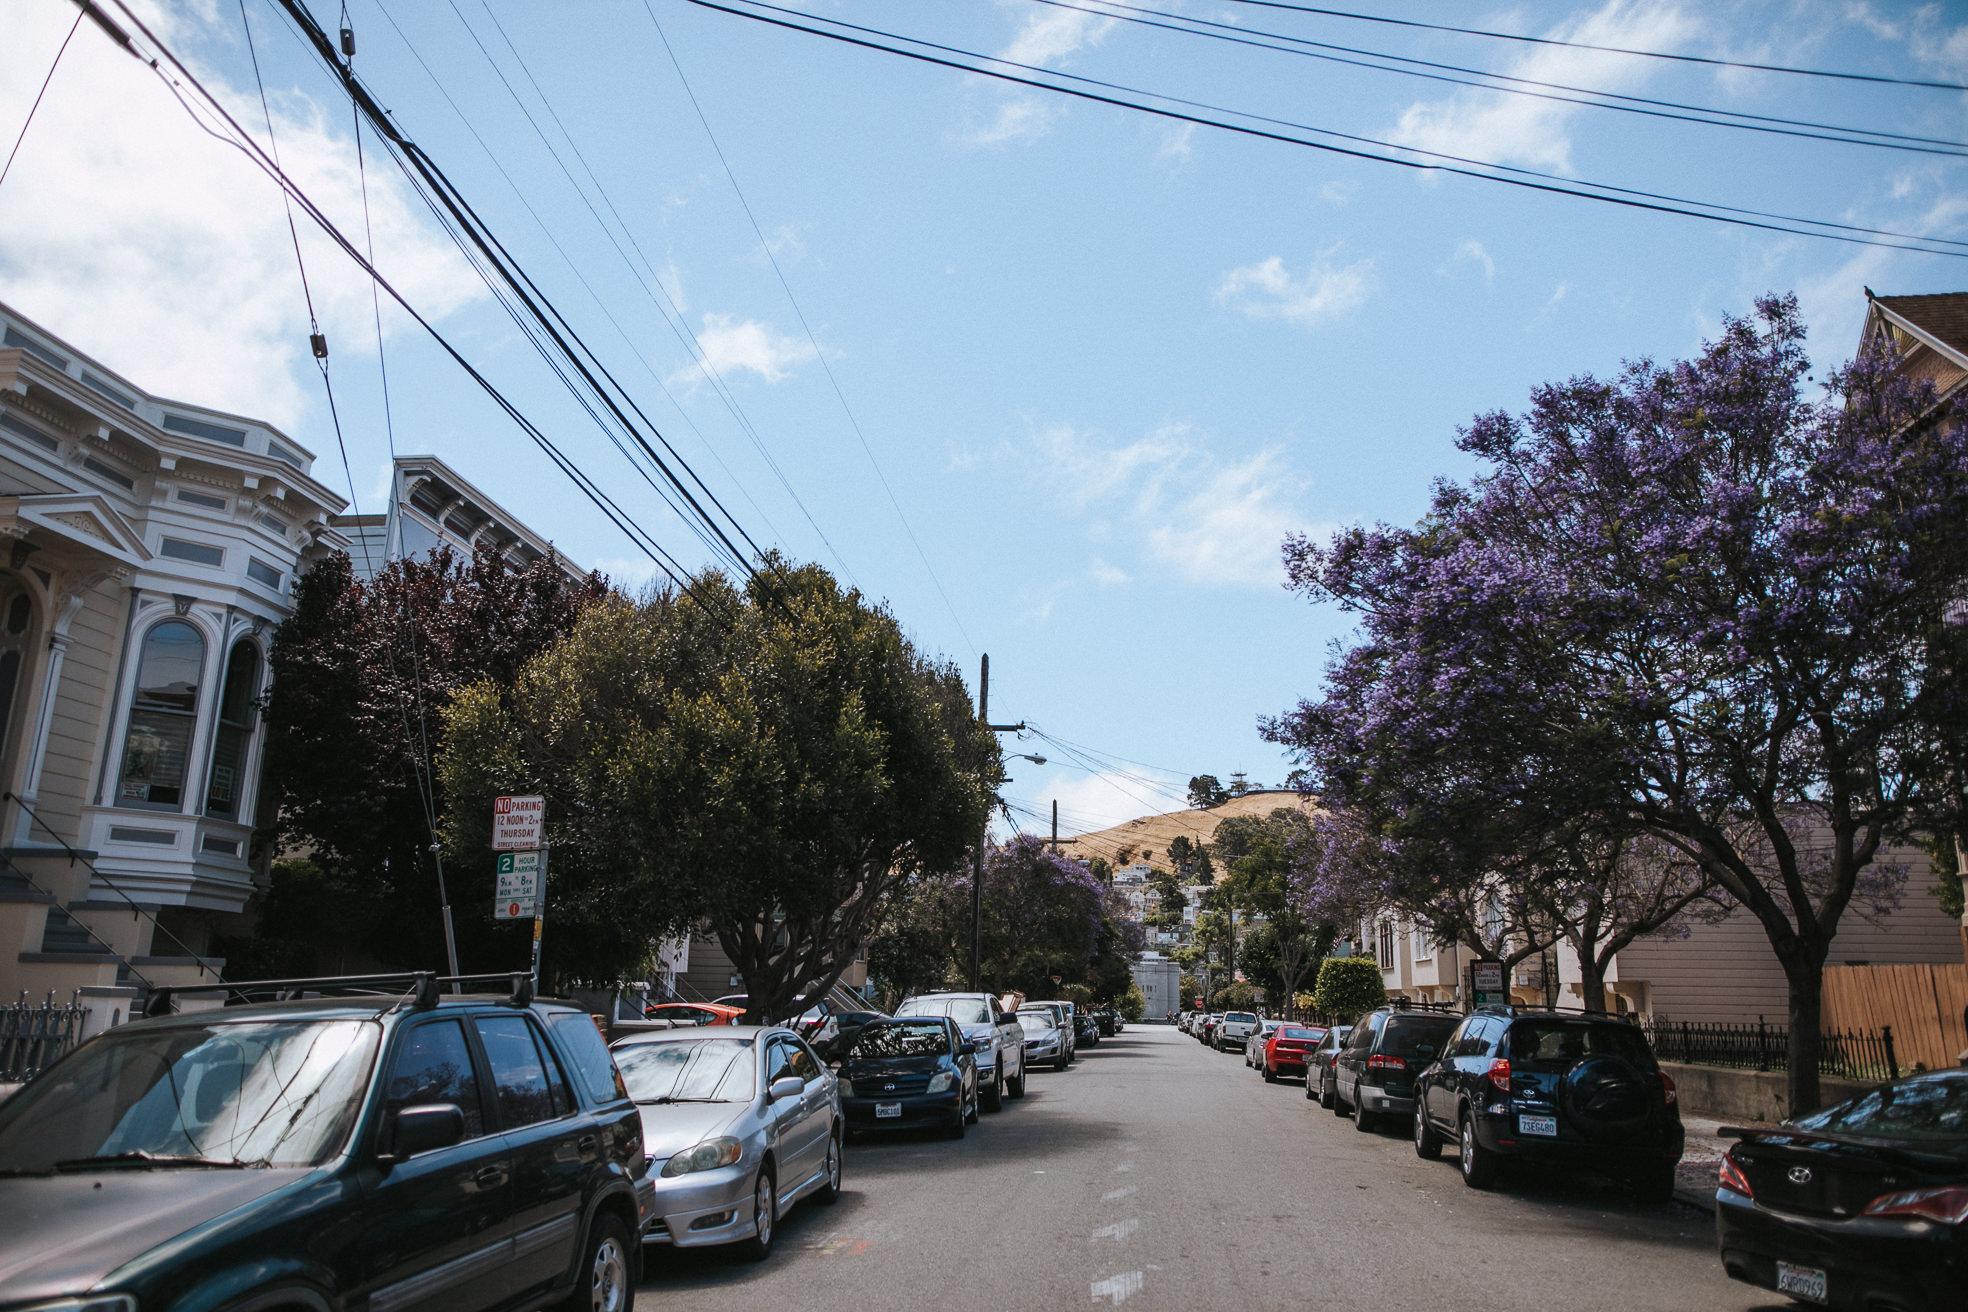 San-Francisco-BildervomLeben-4944